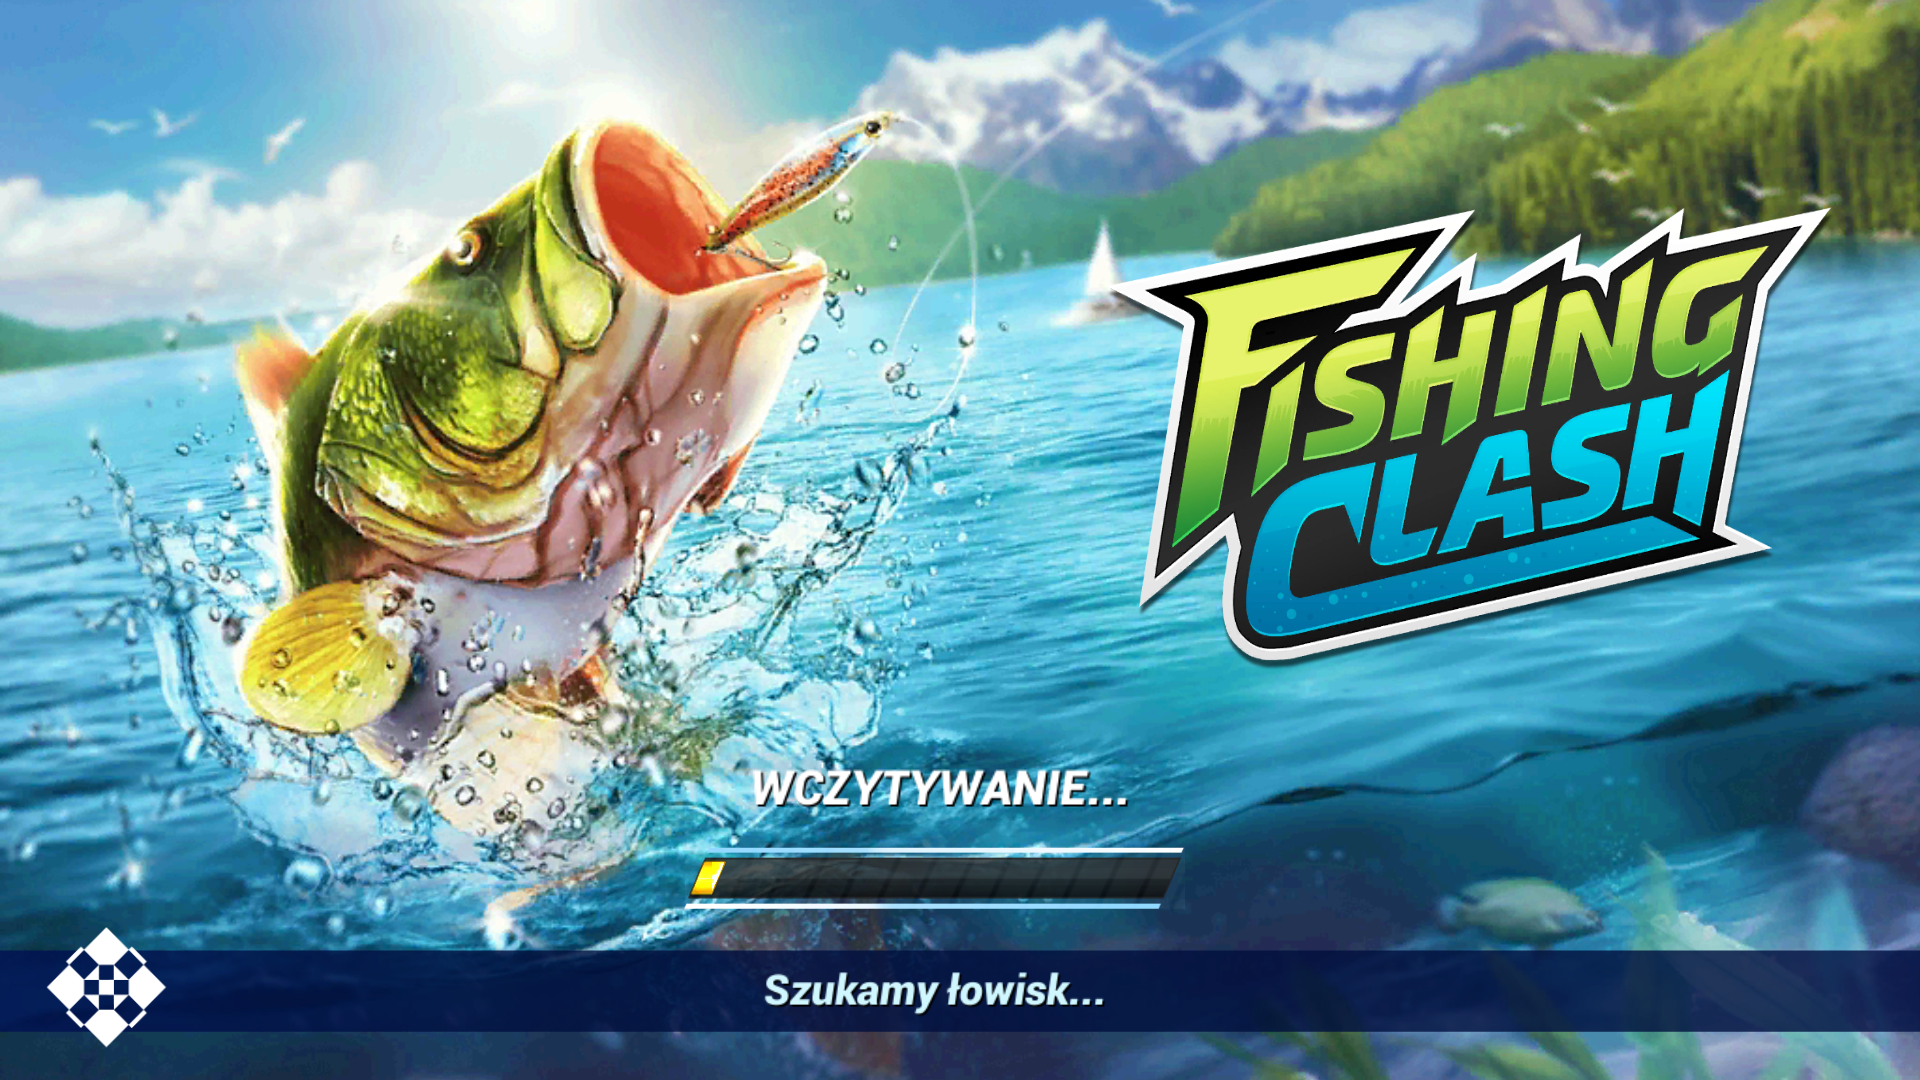 fishingclash - ilustracja ekranu startowego